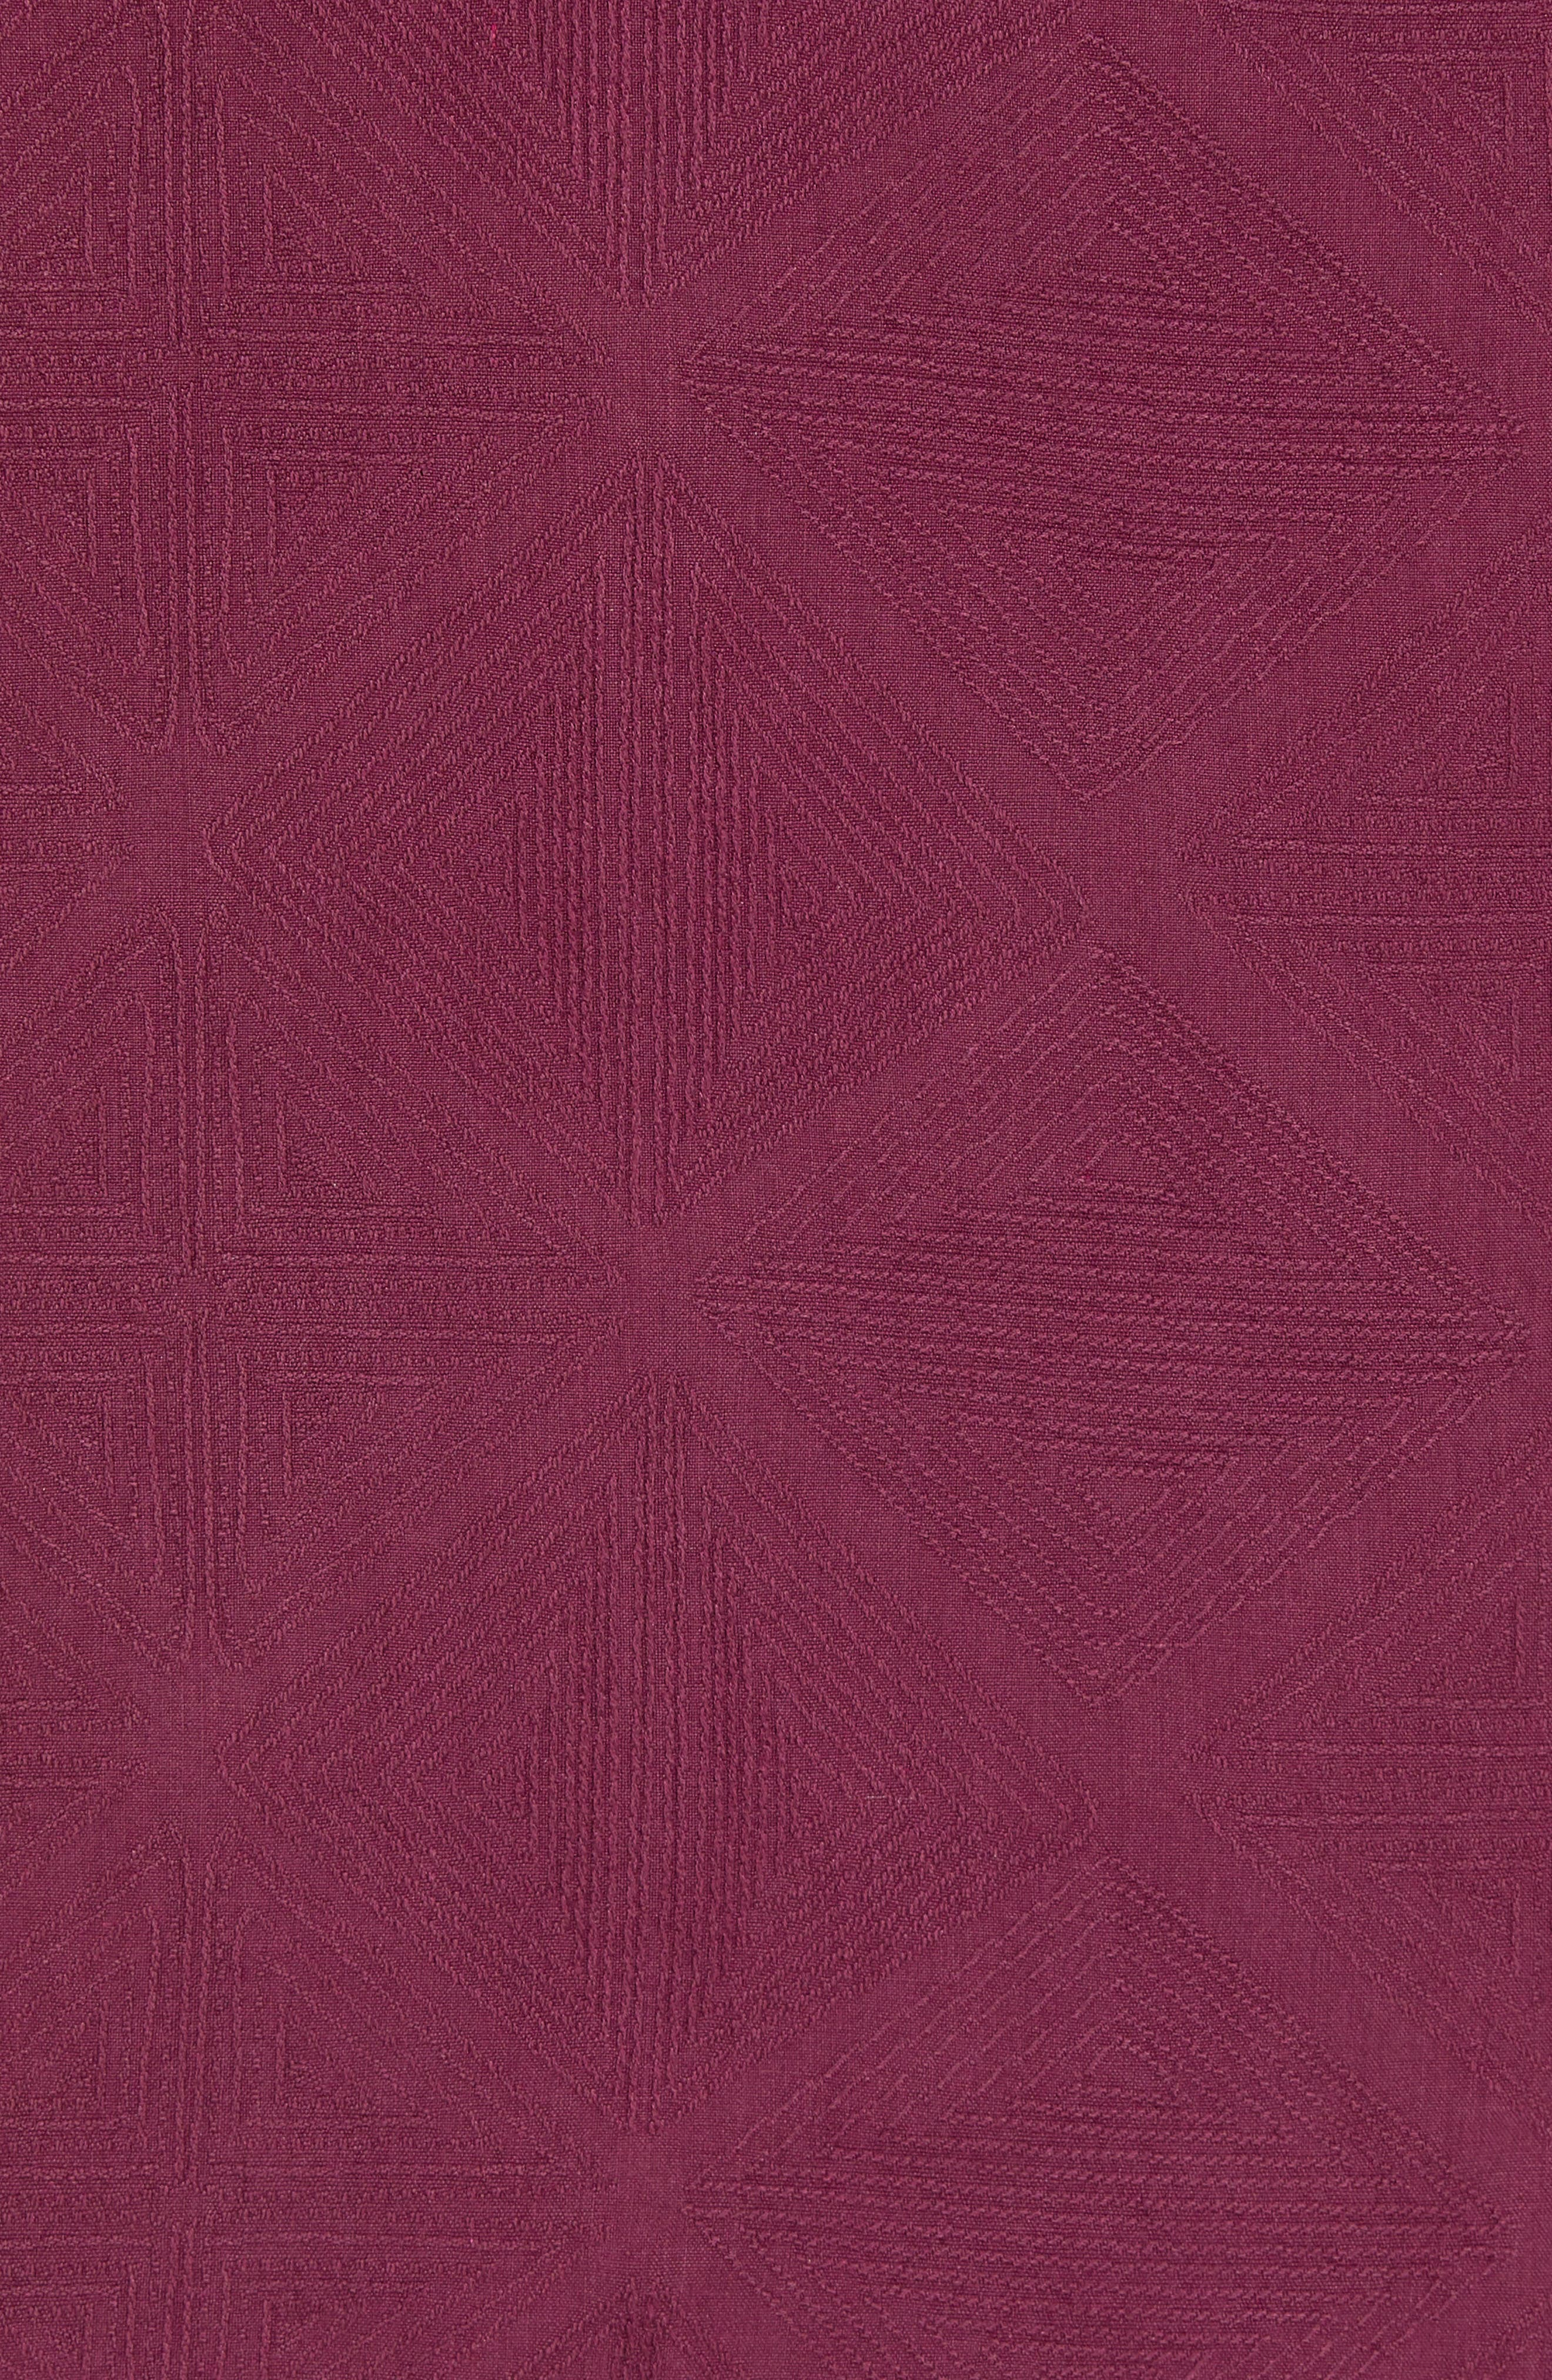 Pura Vino Embroidered Silk Sport Shirt,                             Alternate thumbnail 5, color,                             GRAPE WINE